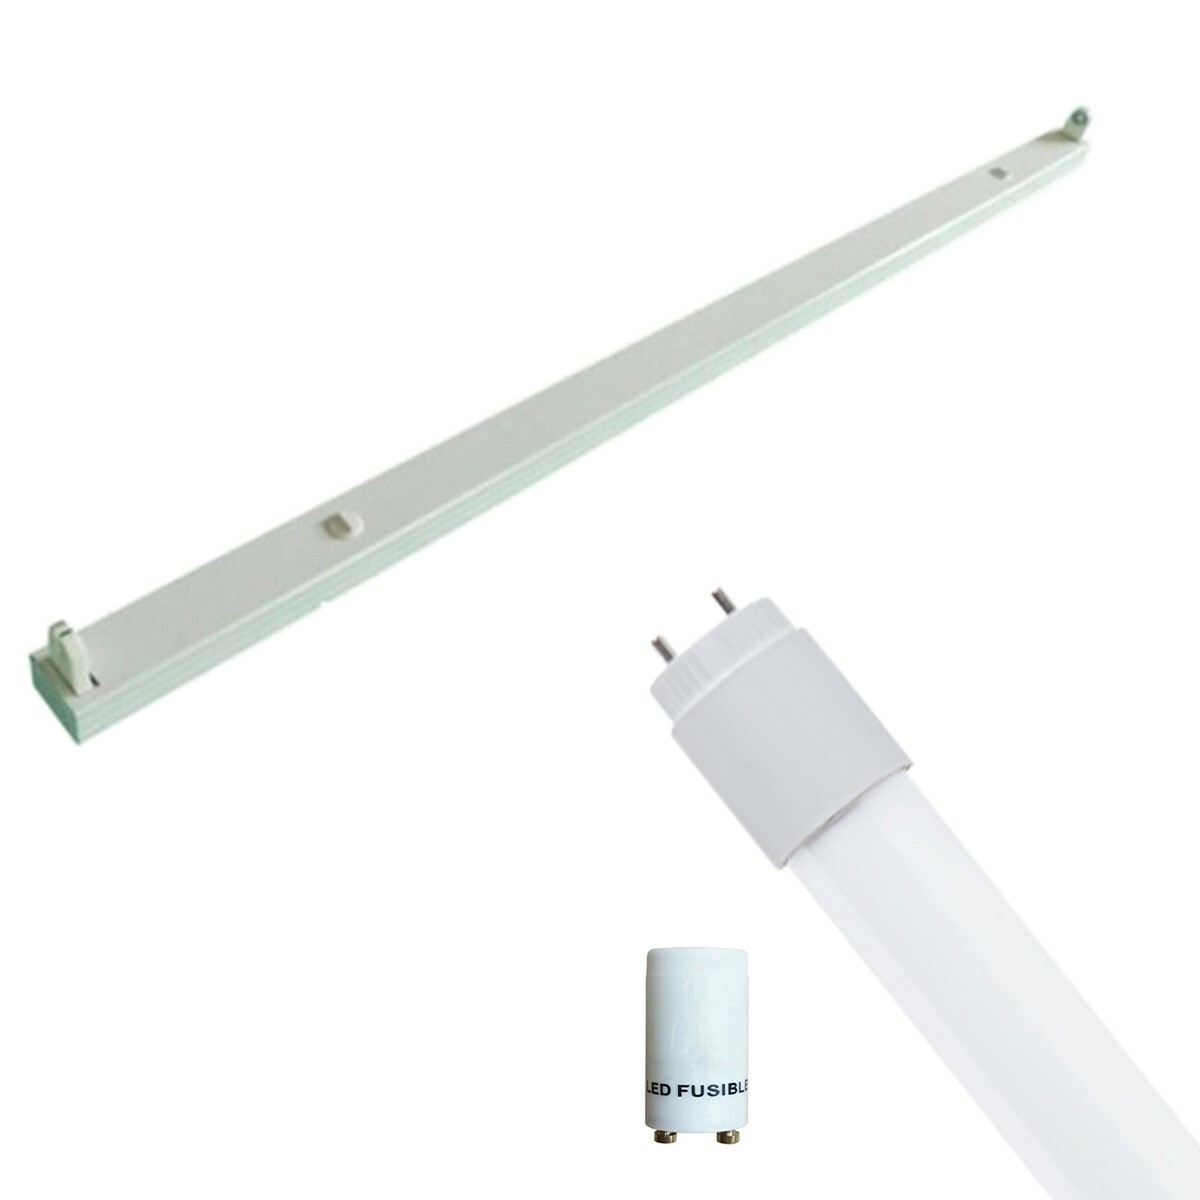 LED TL Armatuur met T8 Buis Incl. Starter - Aigi Dybolo - 120cm Enkel - 16W - Natuurlijk Wit 4200K -